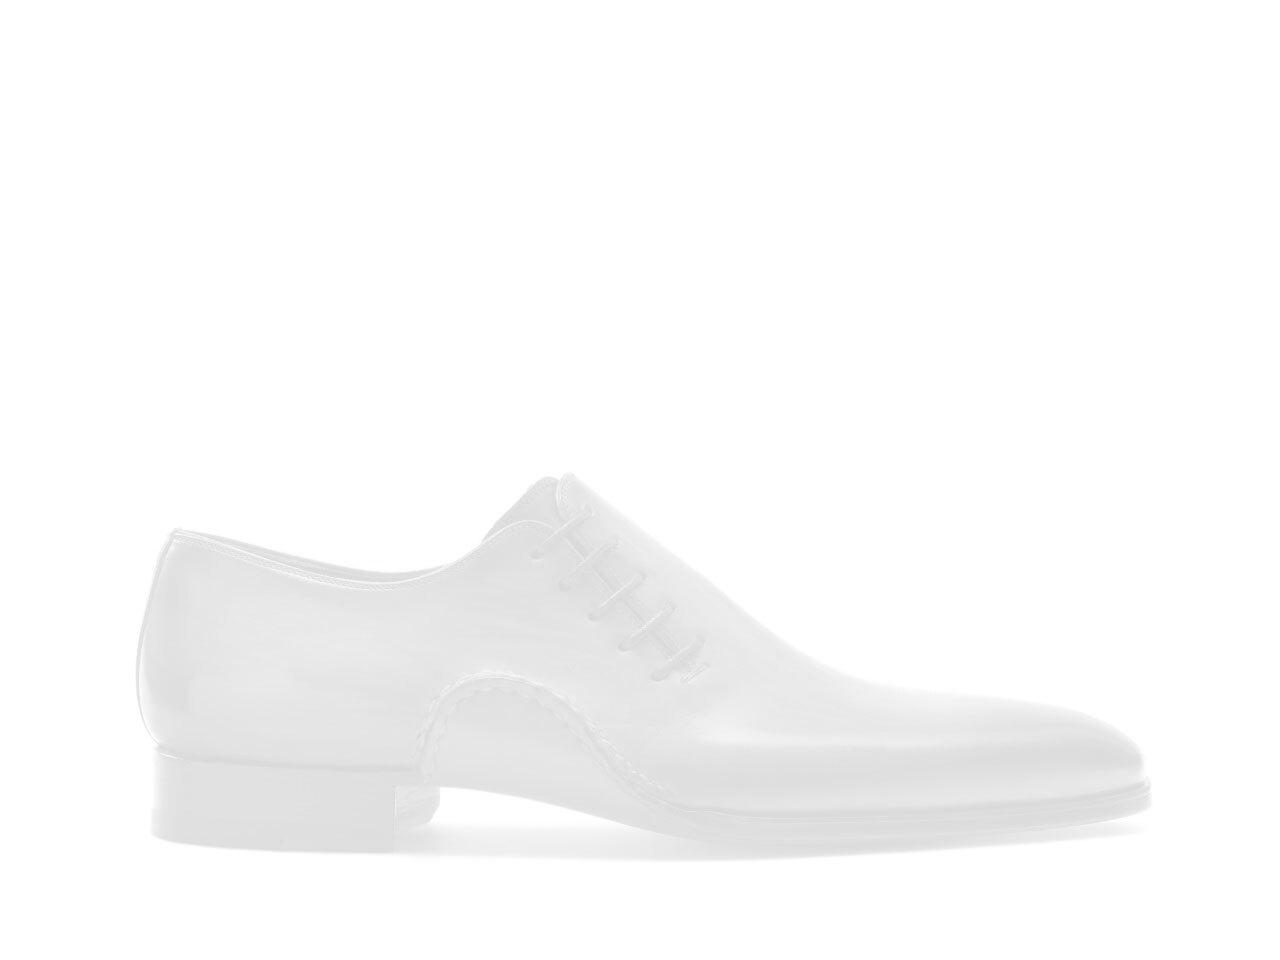 Sole of the Magnanni Siero White Men's Sneakers